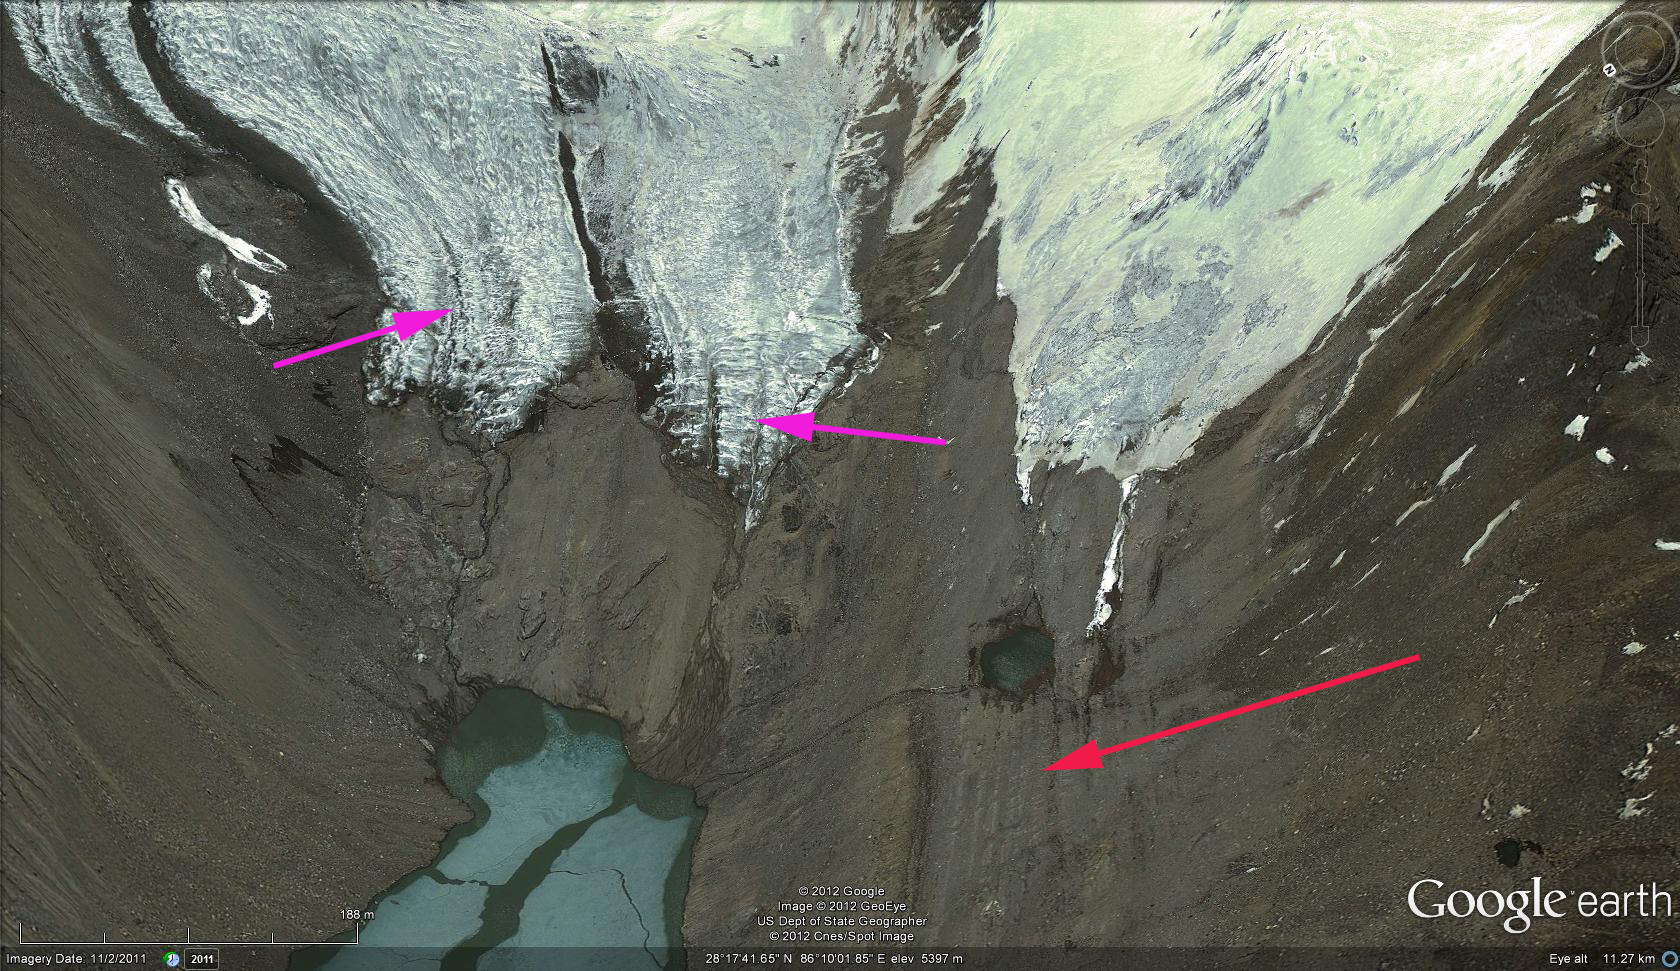 Tibet glacier retreat – From a Glaciers Perspective